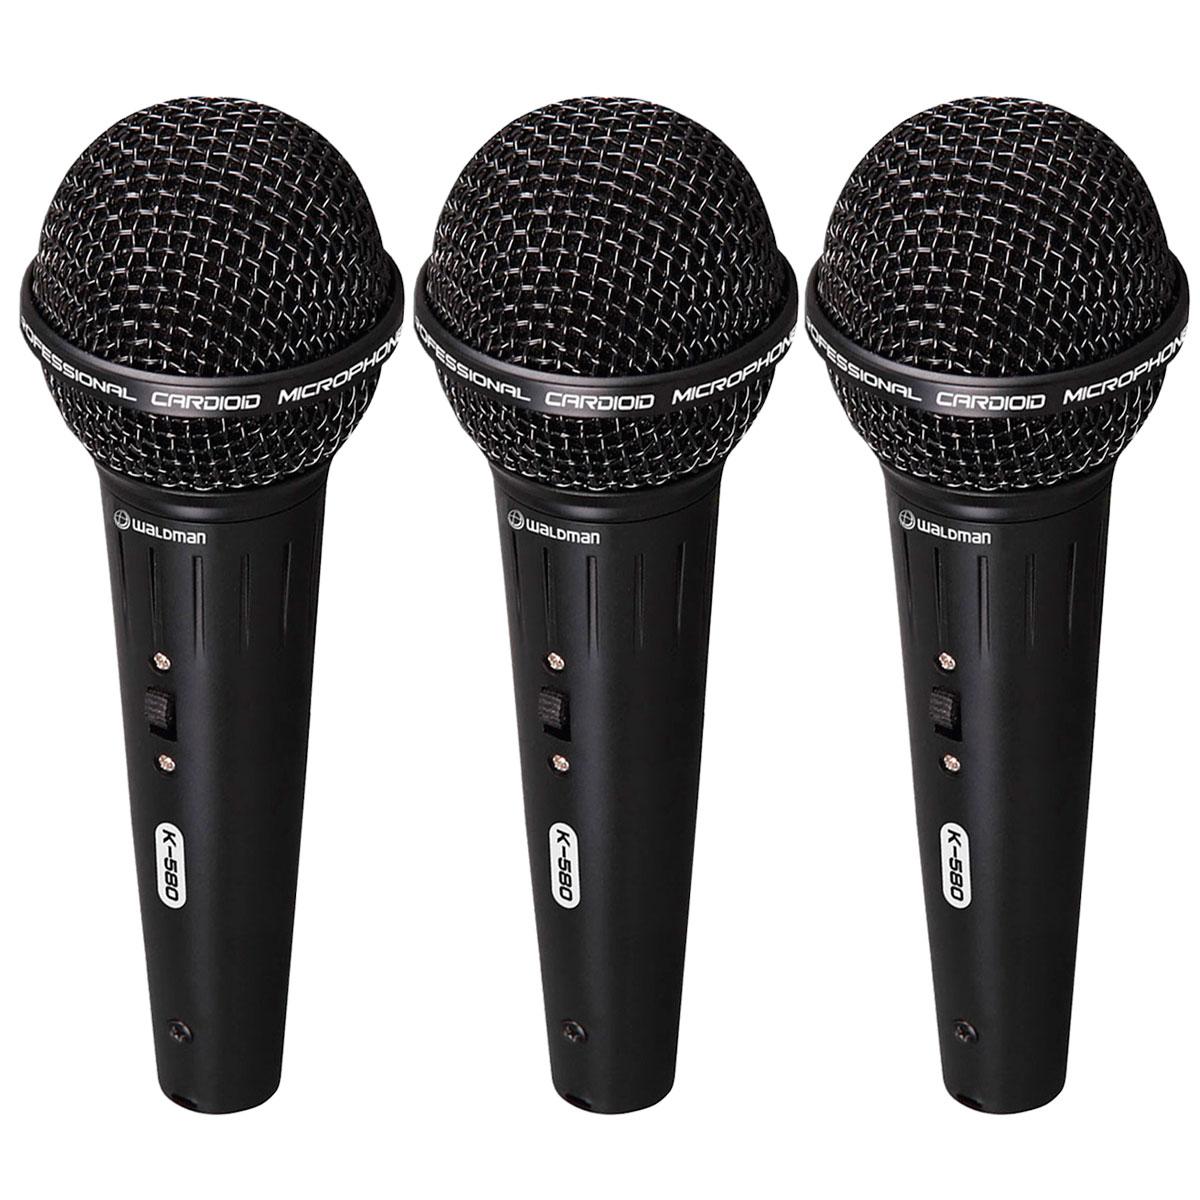 K580 - Kit 3 Microfones c/ Fio de Mão K 580 - Waldman